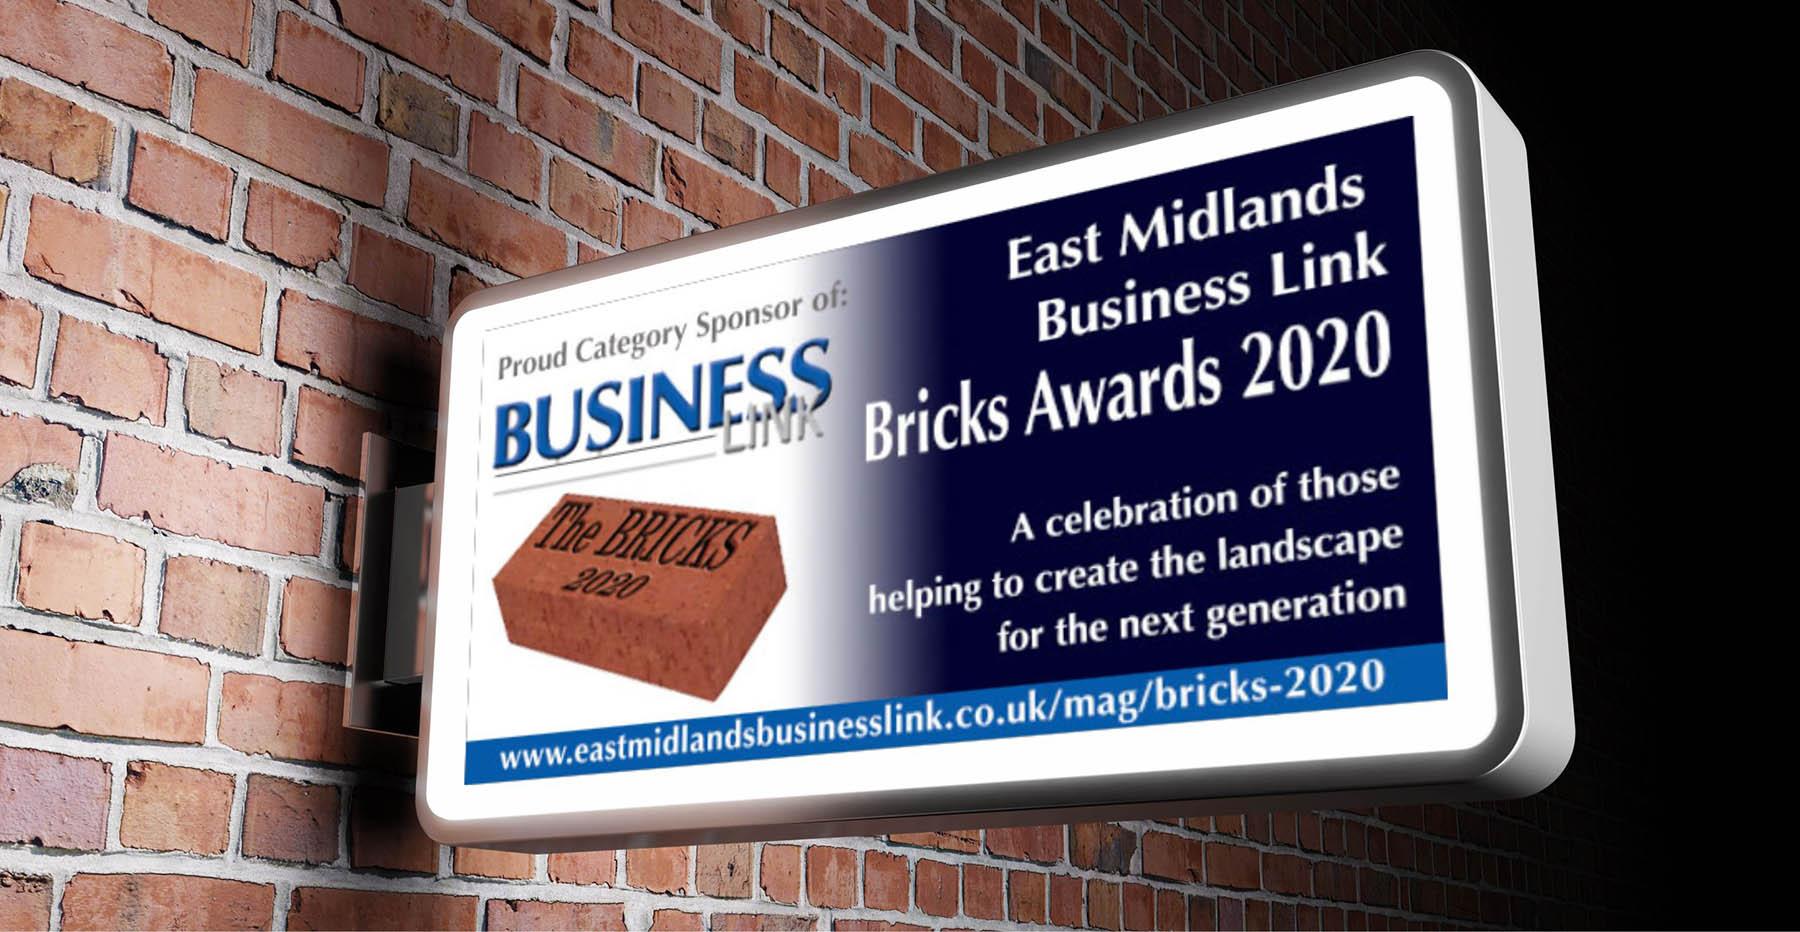 Bricks Award